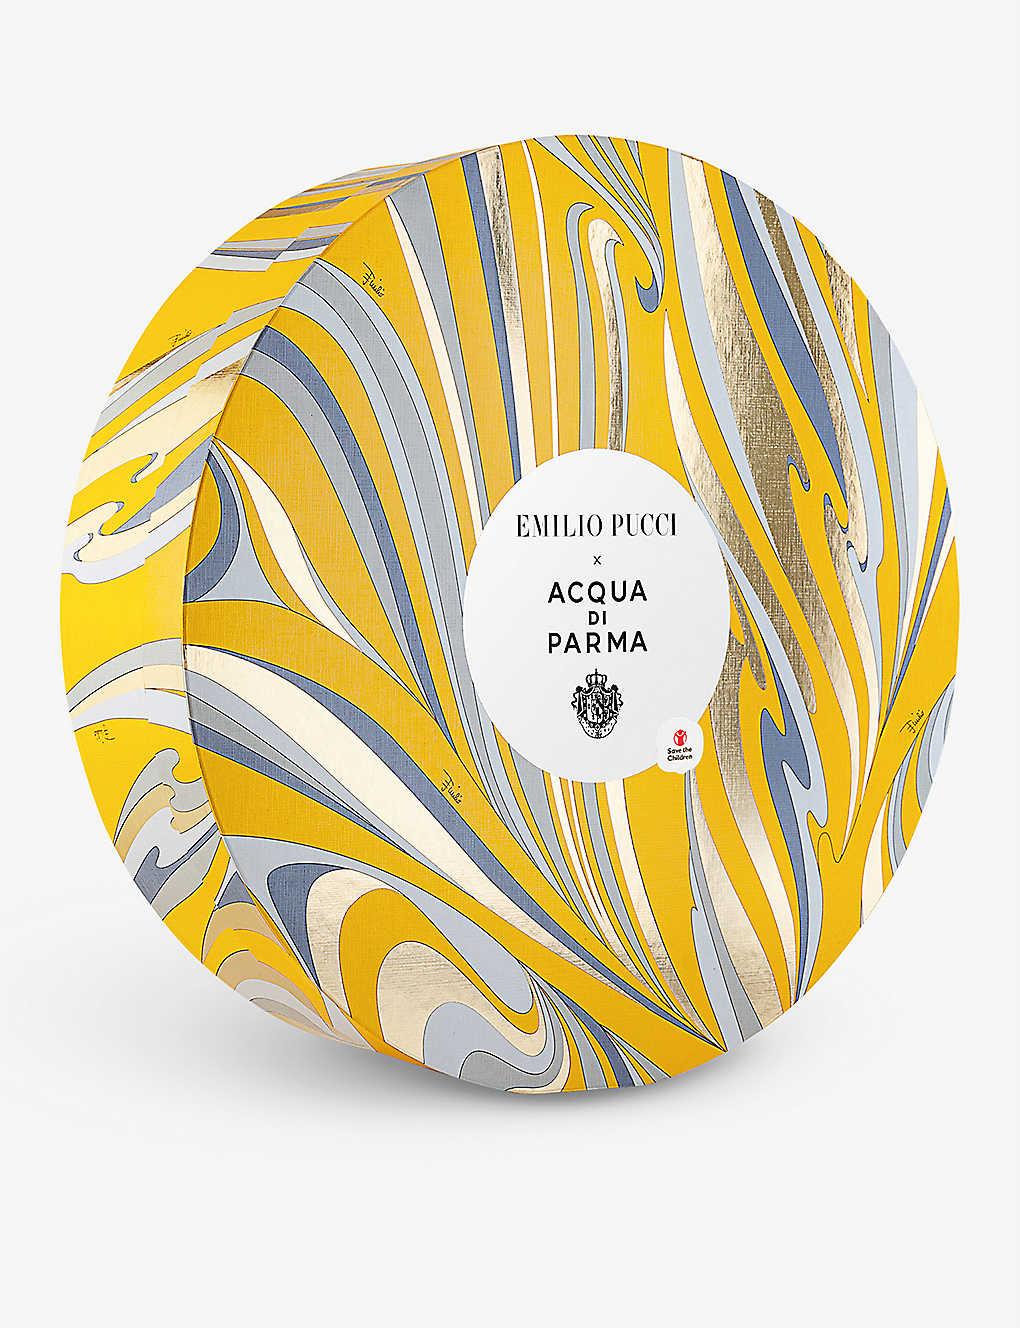 Acqua di Parma Advent Calendar 2021